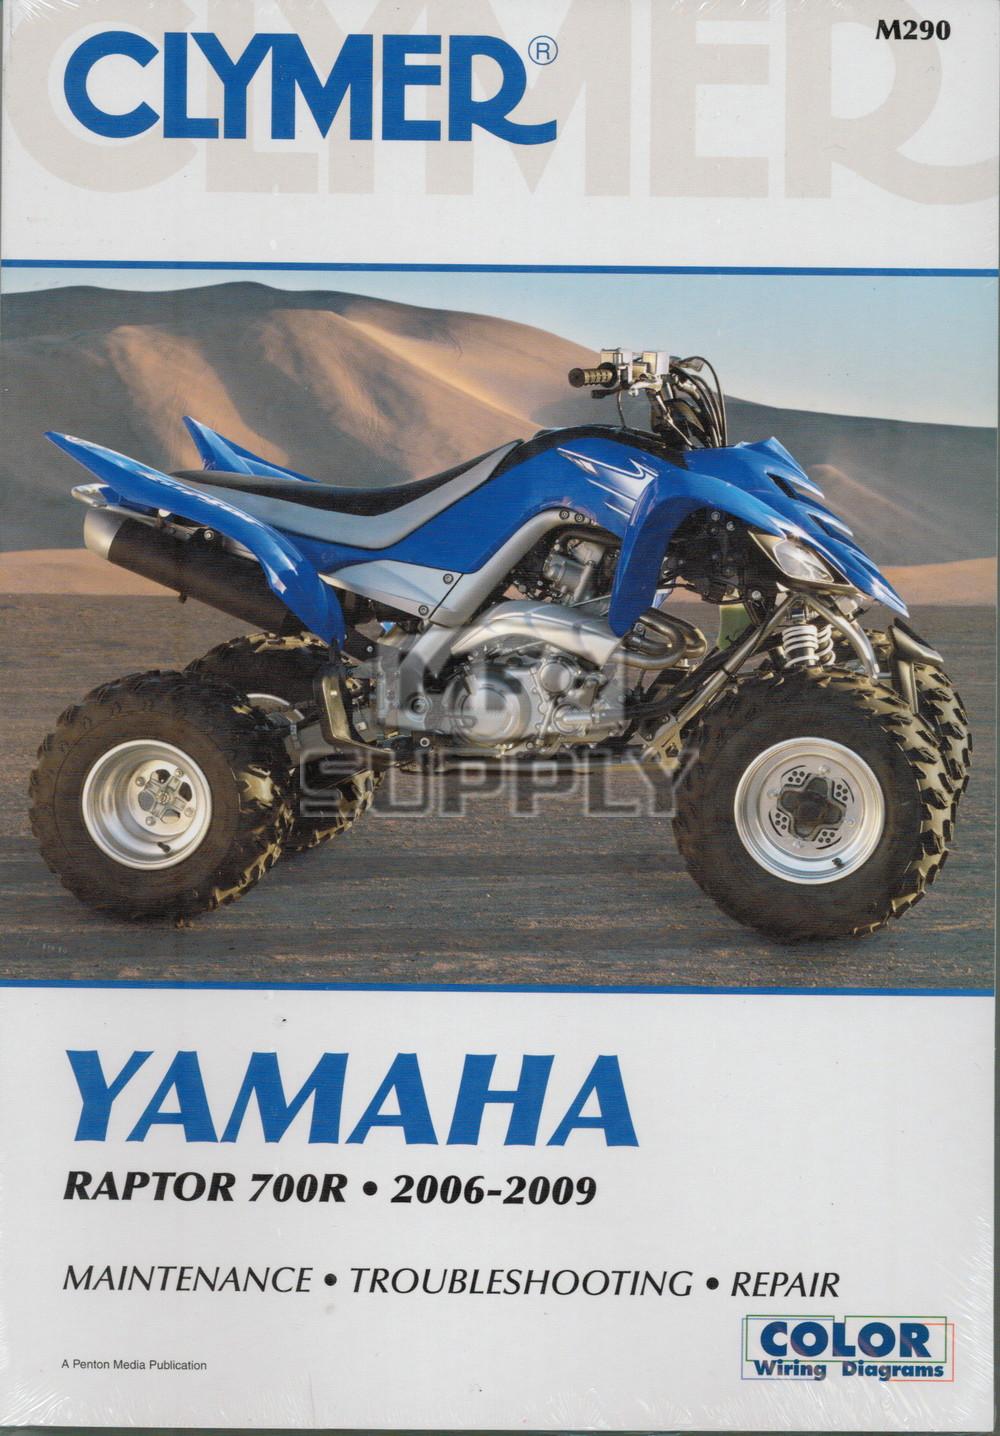 medium resolution of cm290 2006 2009 yamaha raptor 700r repair maintenance manual